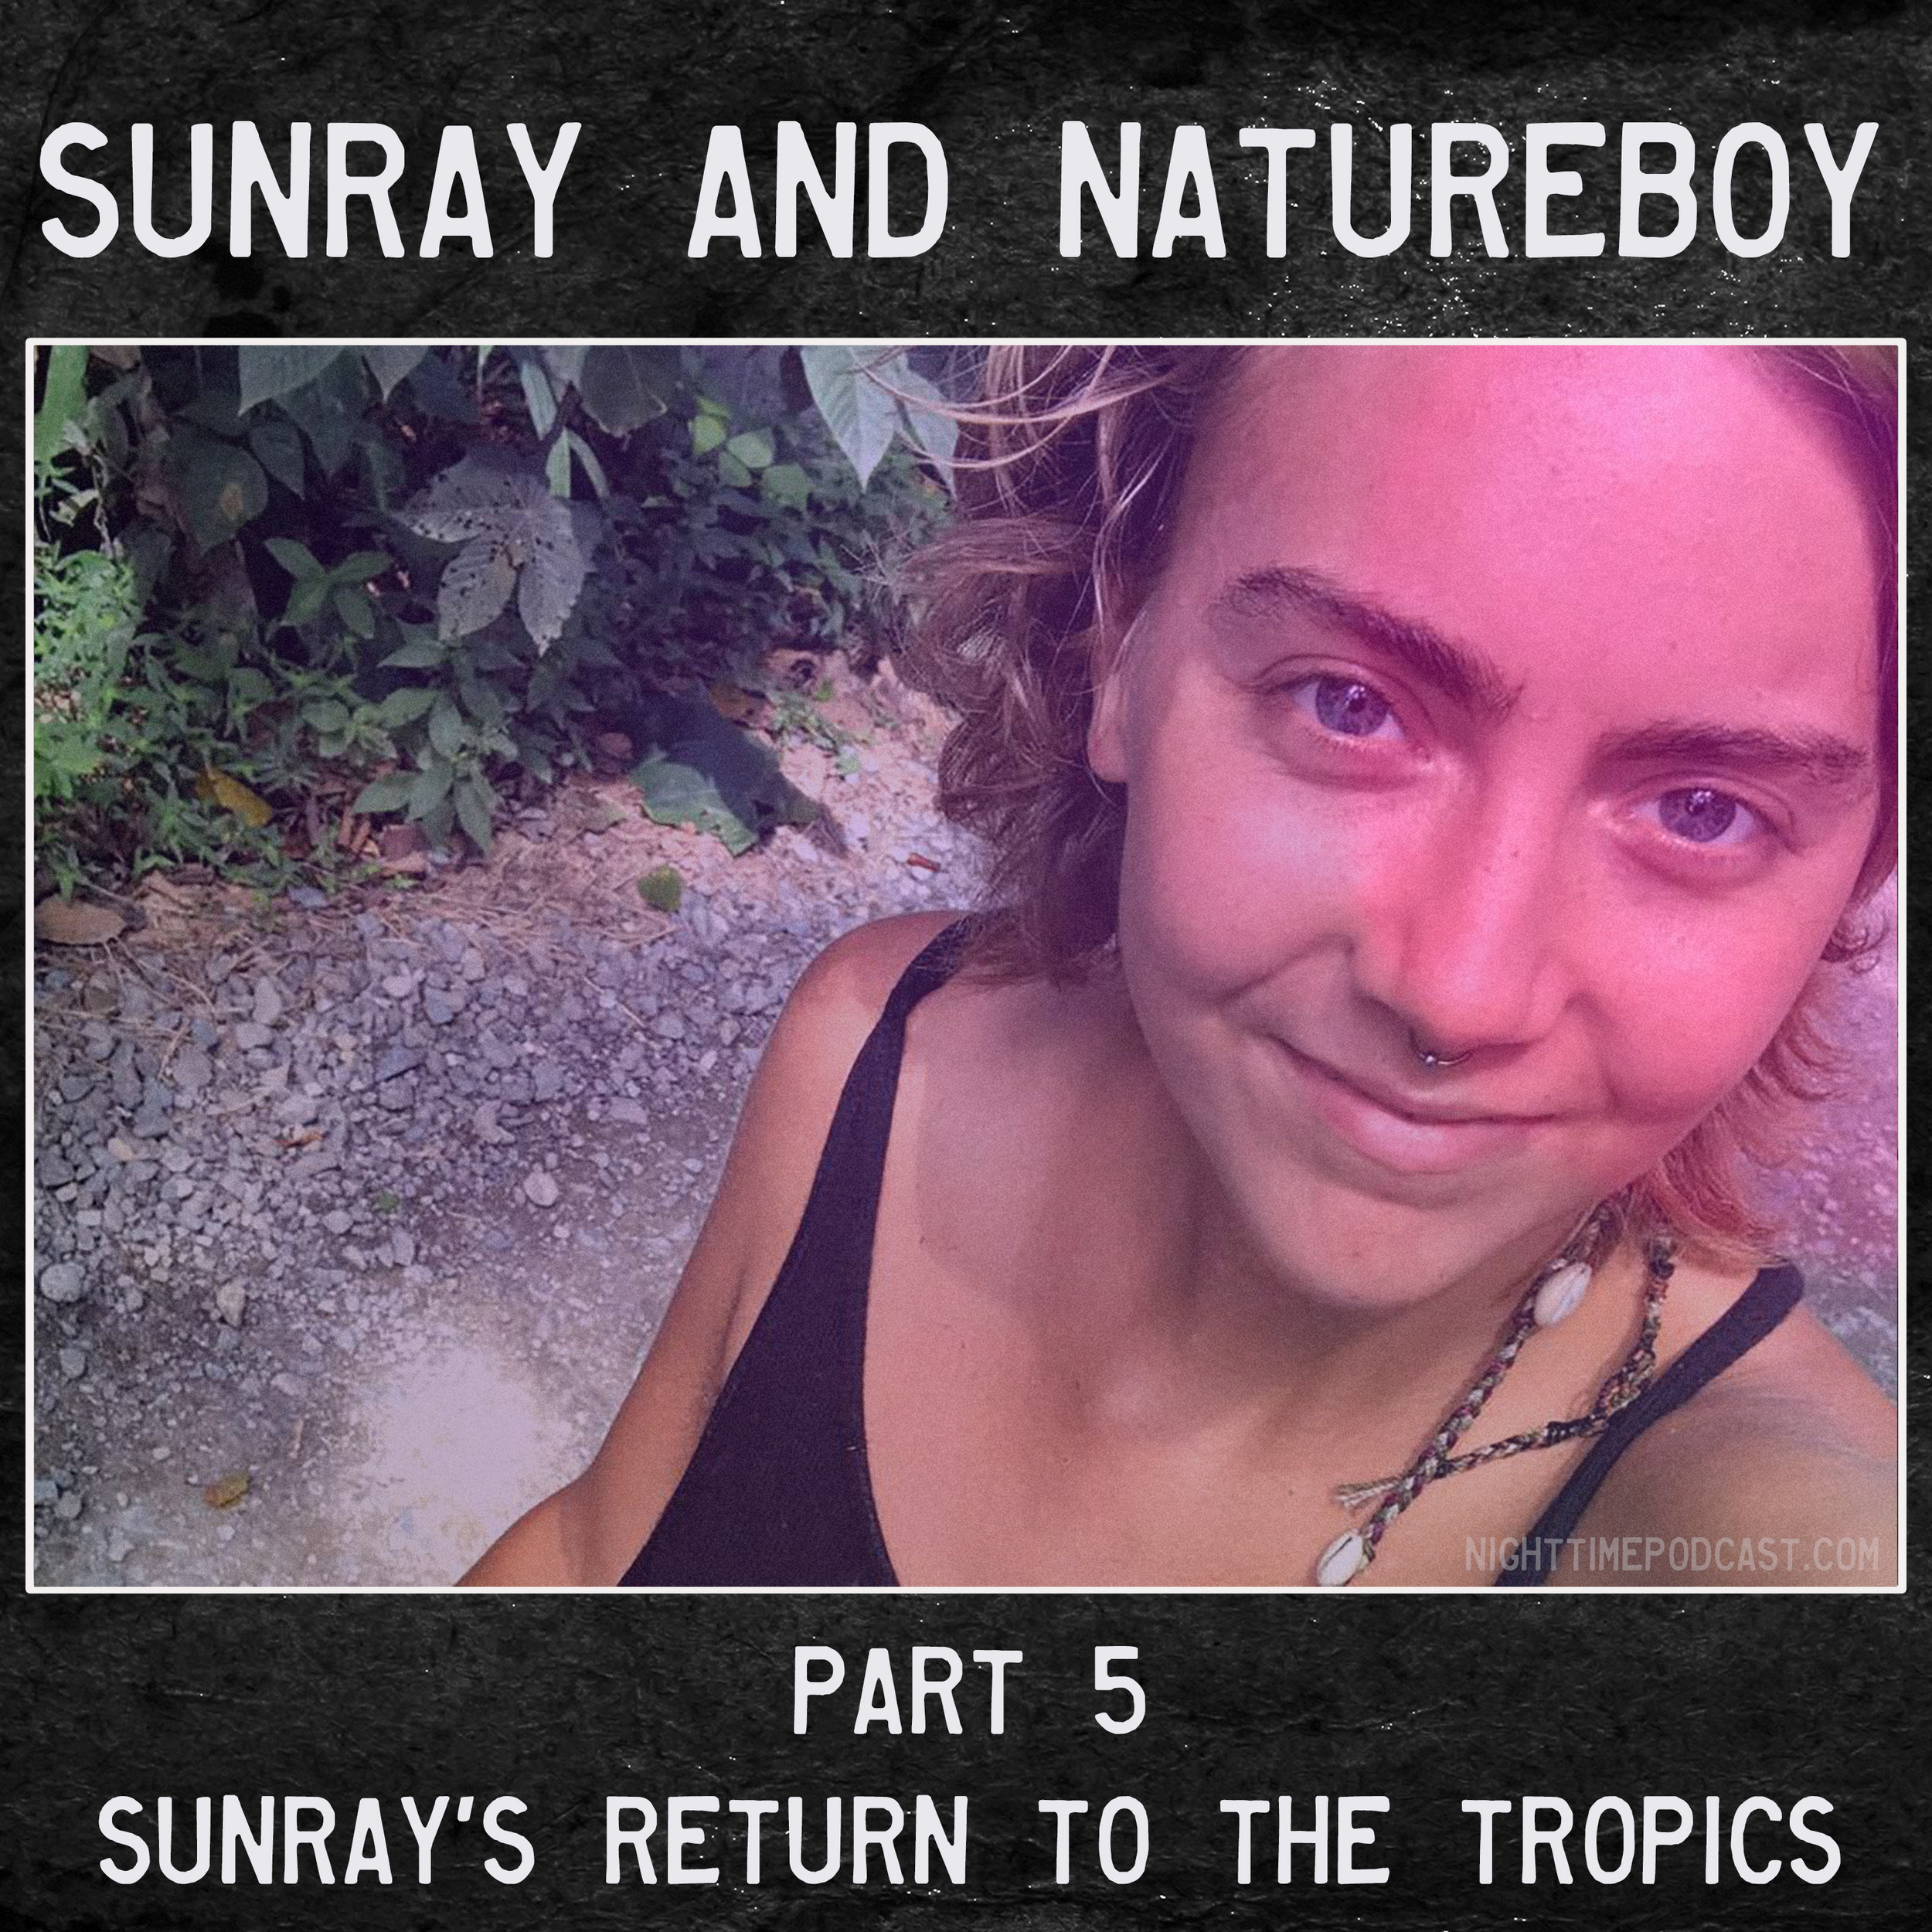 sunray 5 cover.jpg